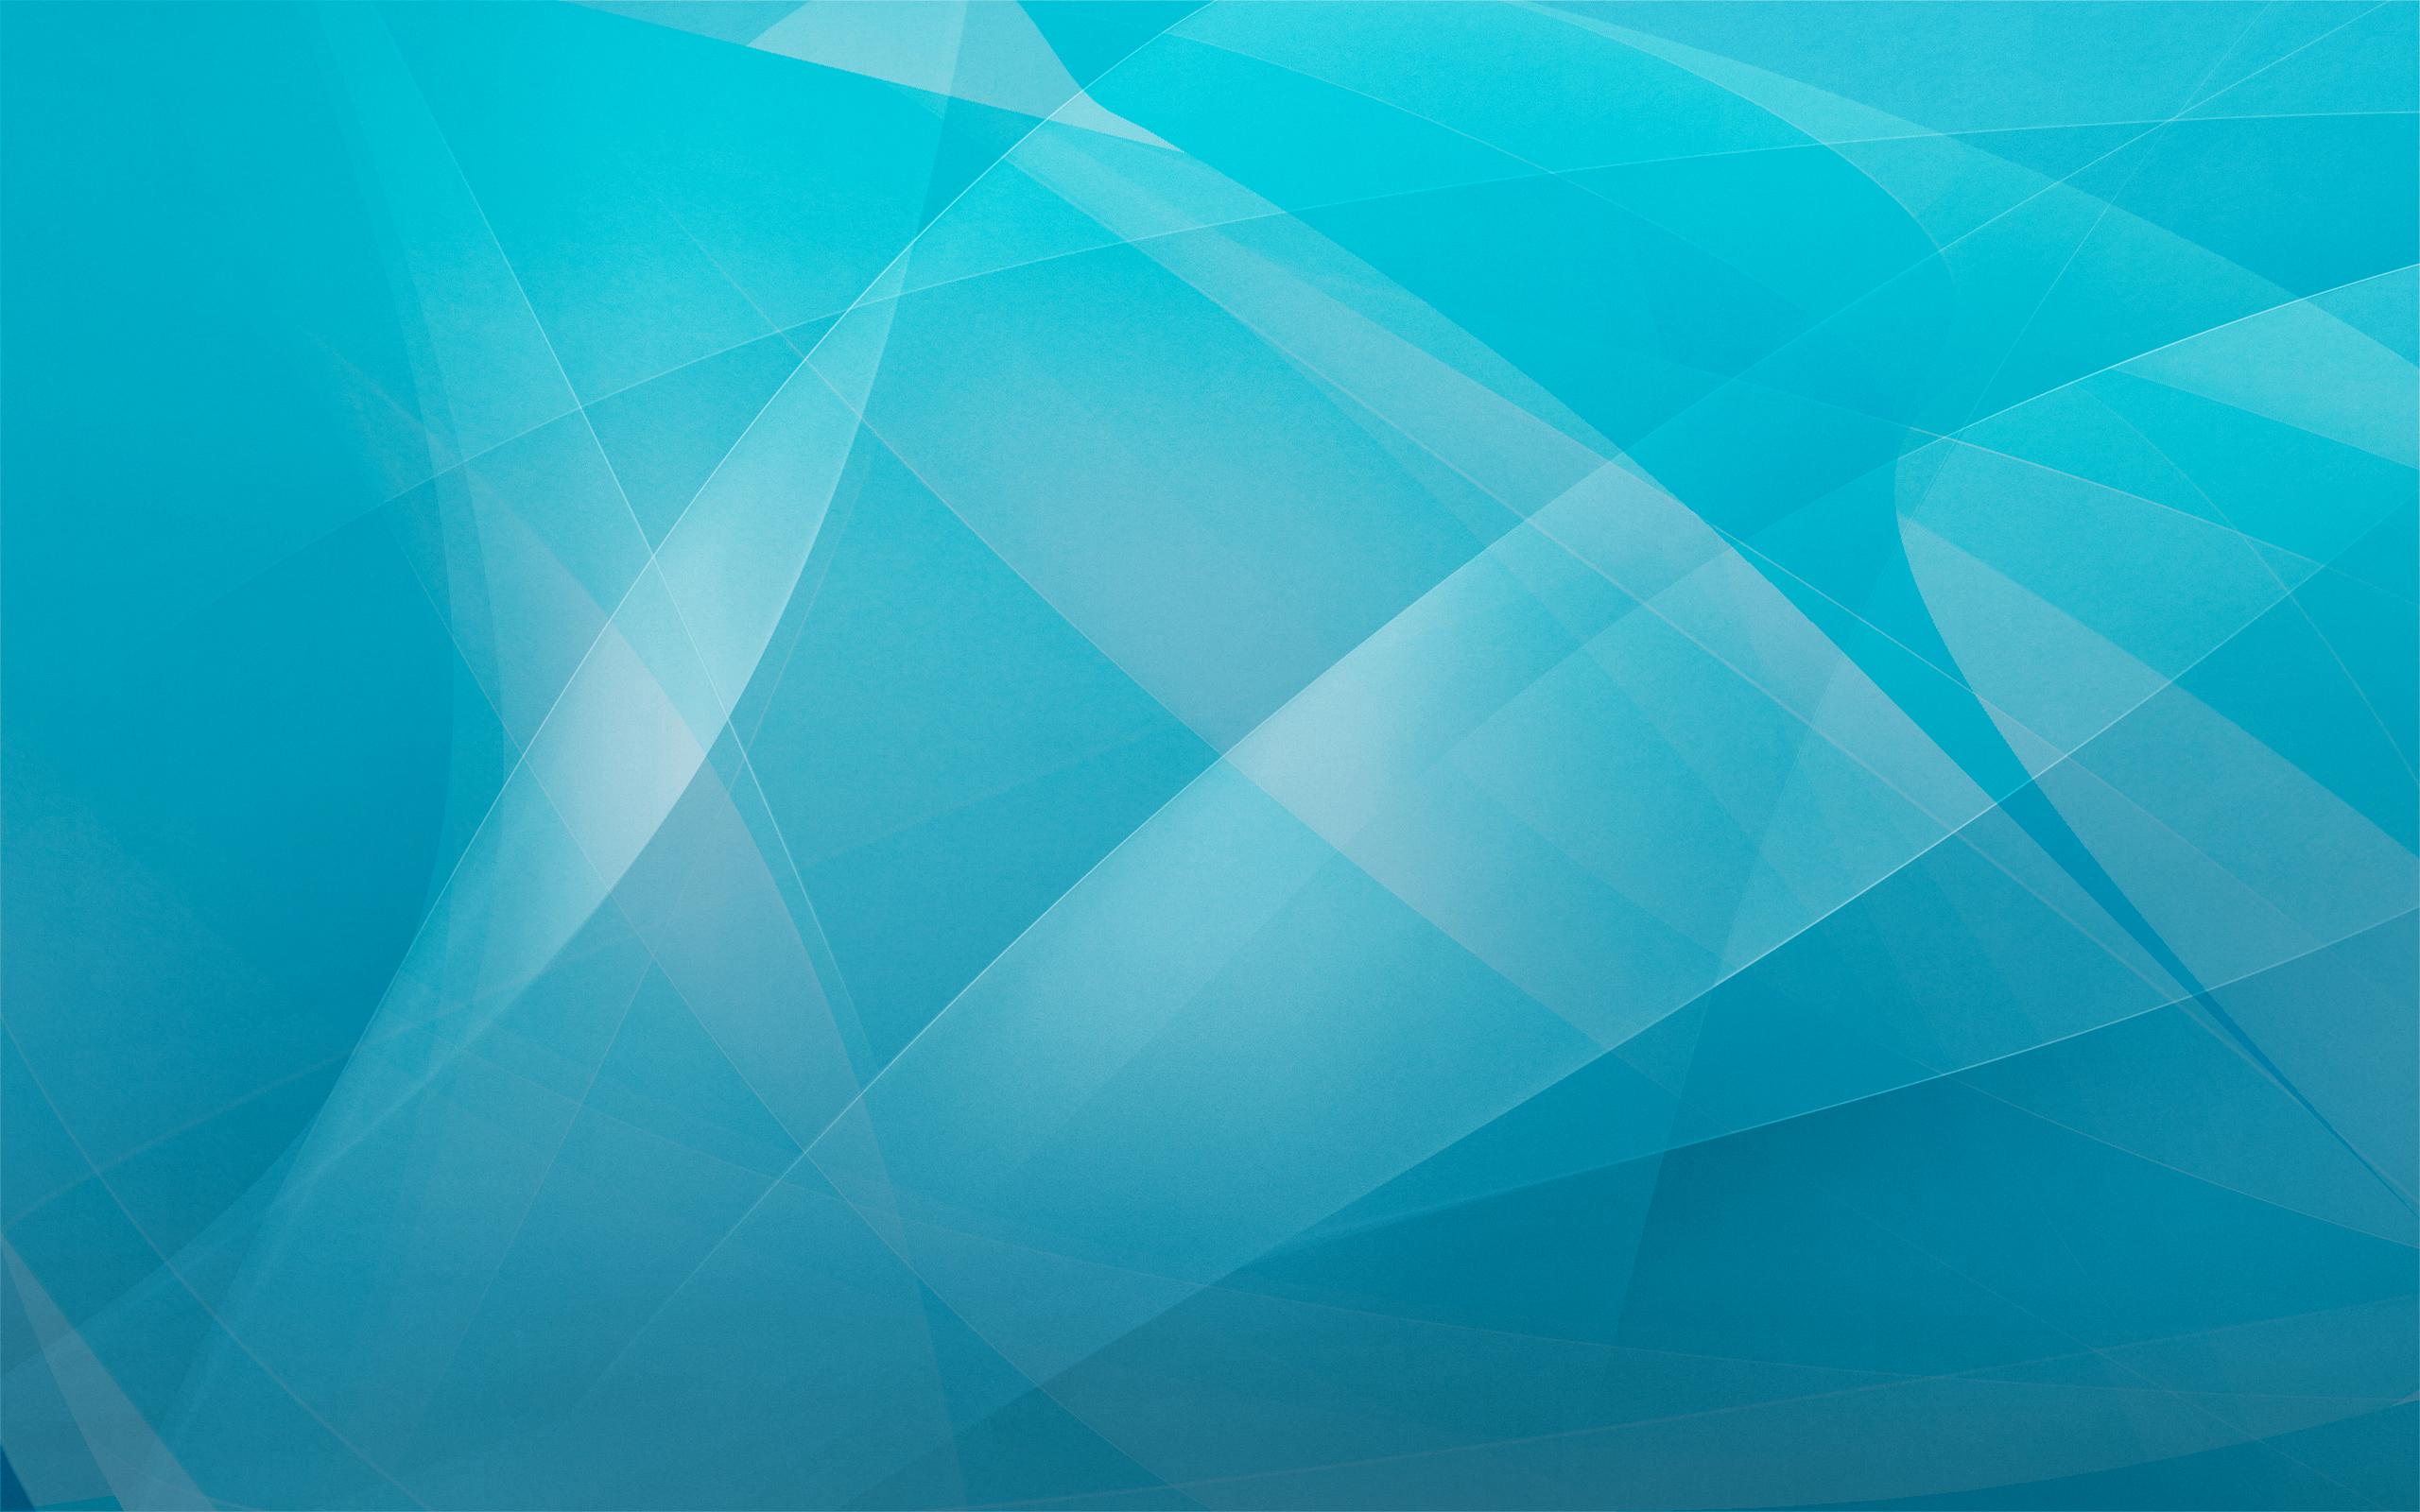 Turquoise wallpaper wallpapersafari - Turquoise wallpaper pinterest ...